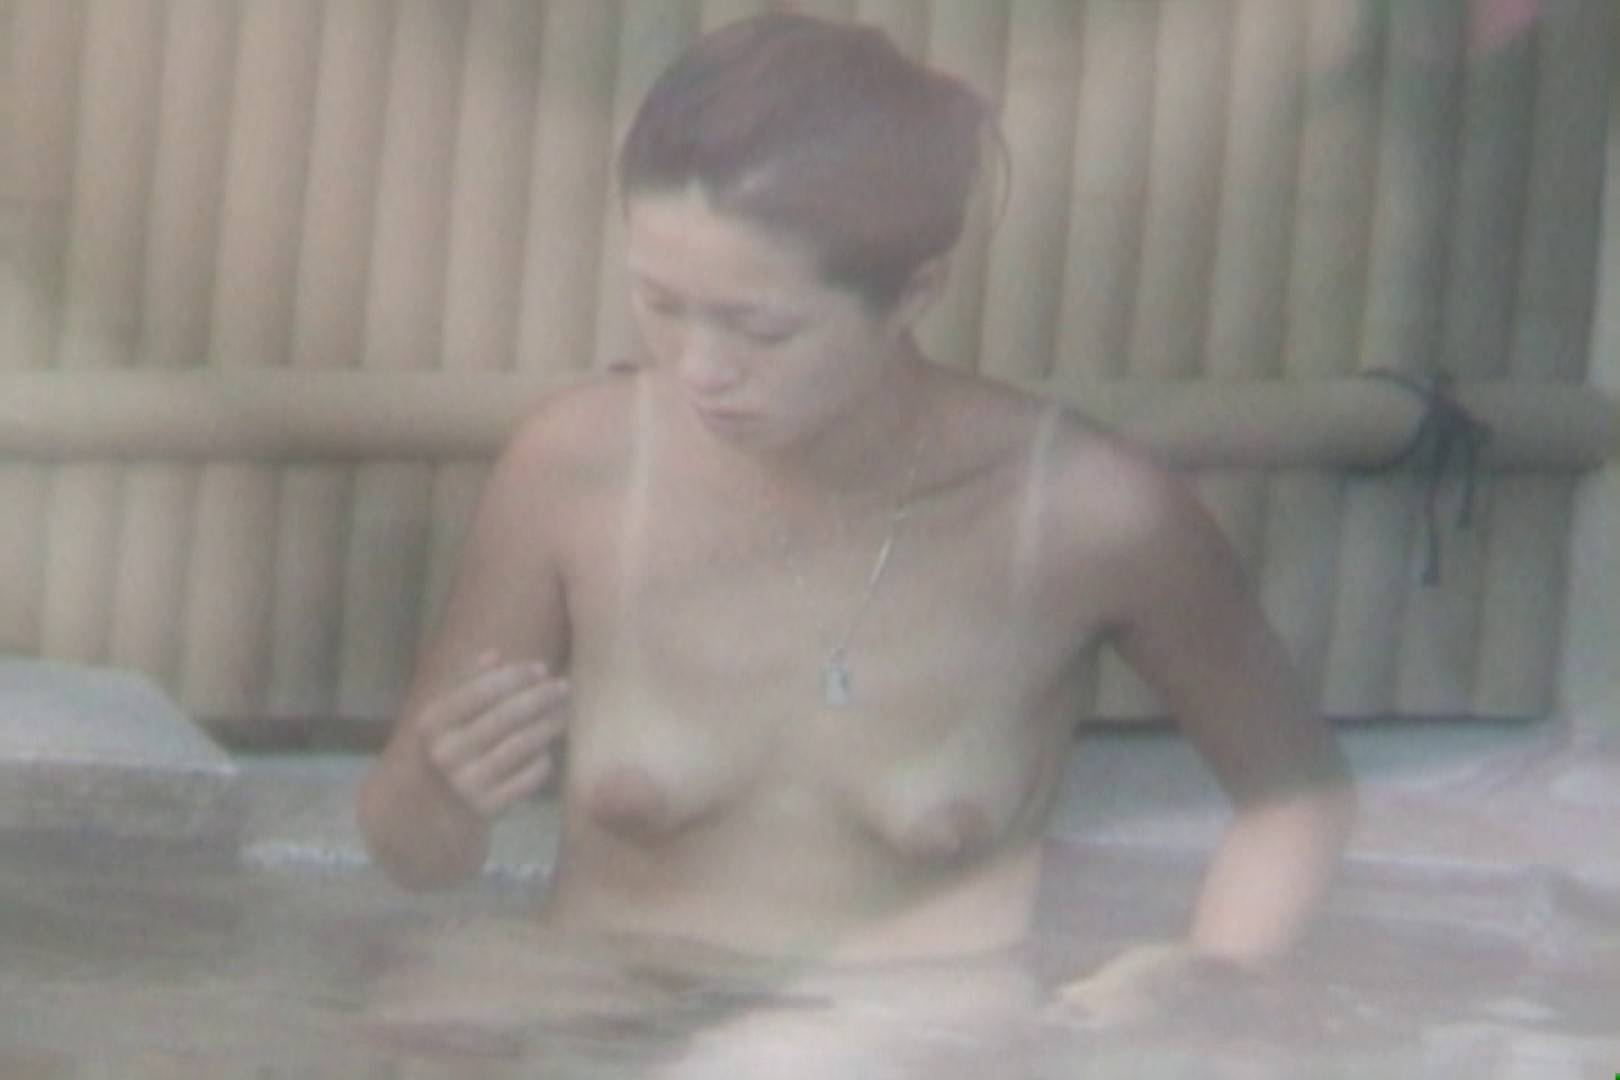 Aquaな露天風呂Vol.571 盗撮 | OLセックス  83画像 16